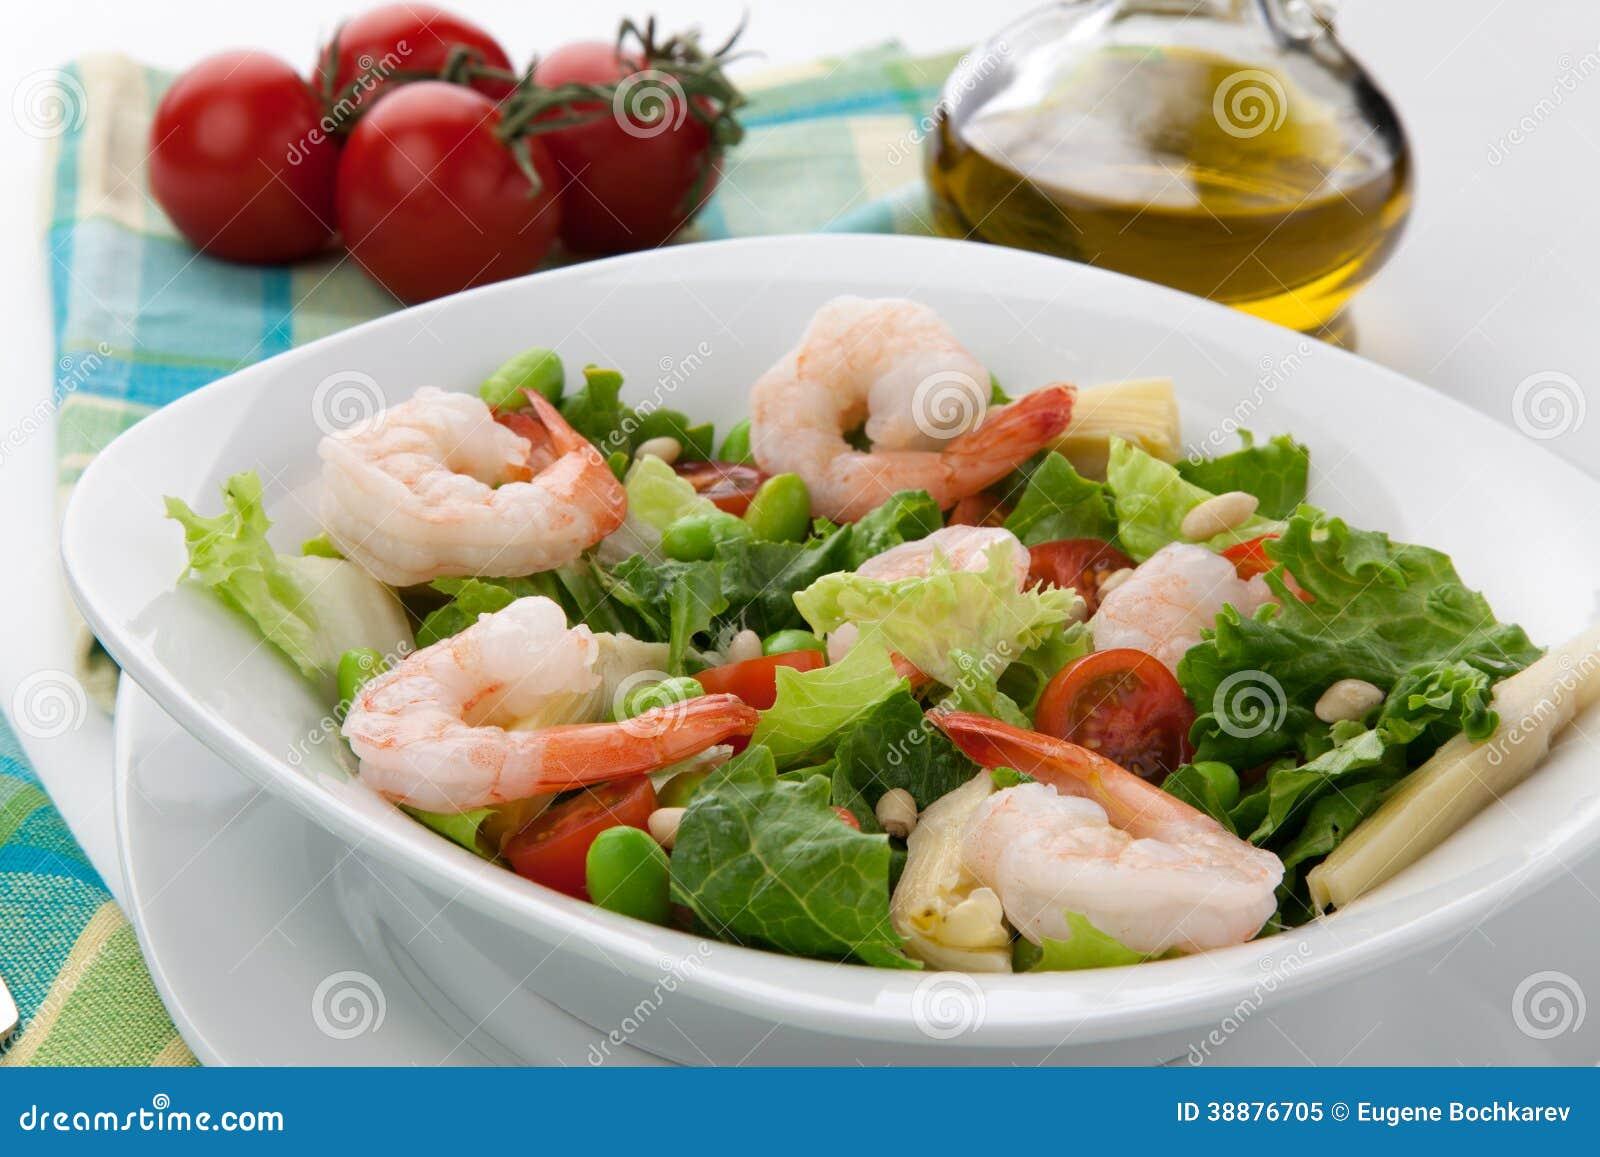 Italian Shrimp Salad Stock Photo - Image: 38876705